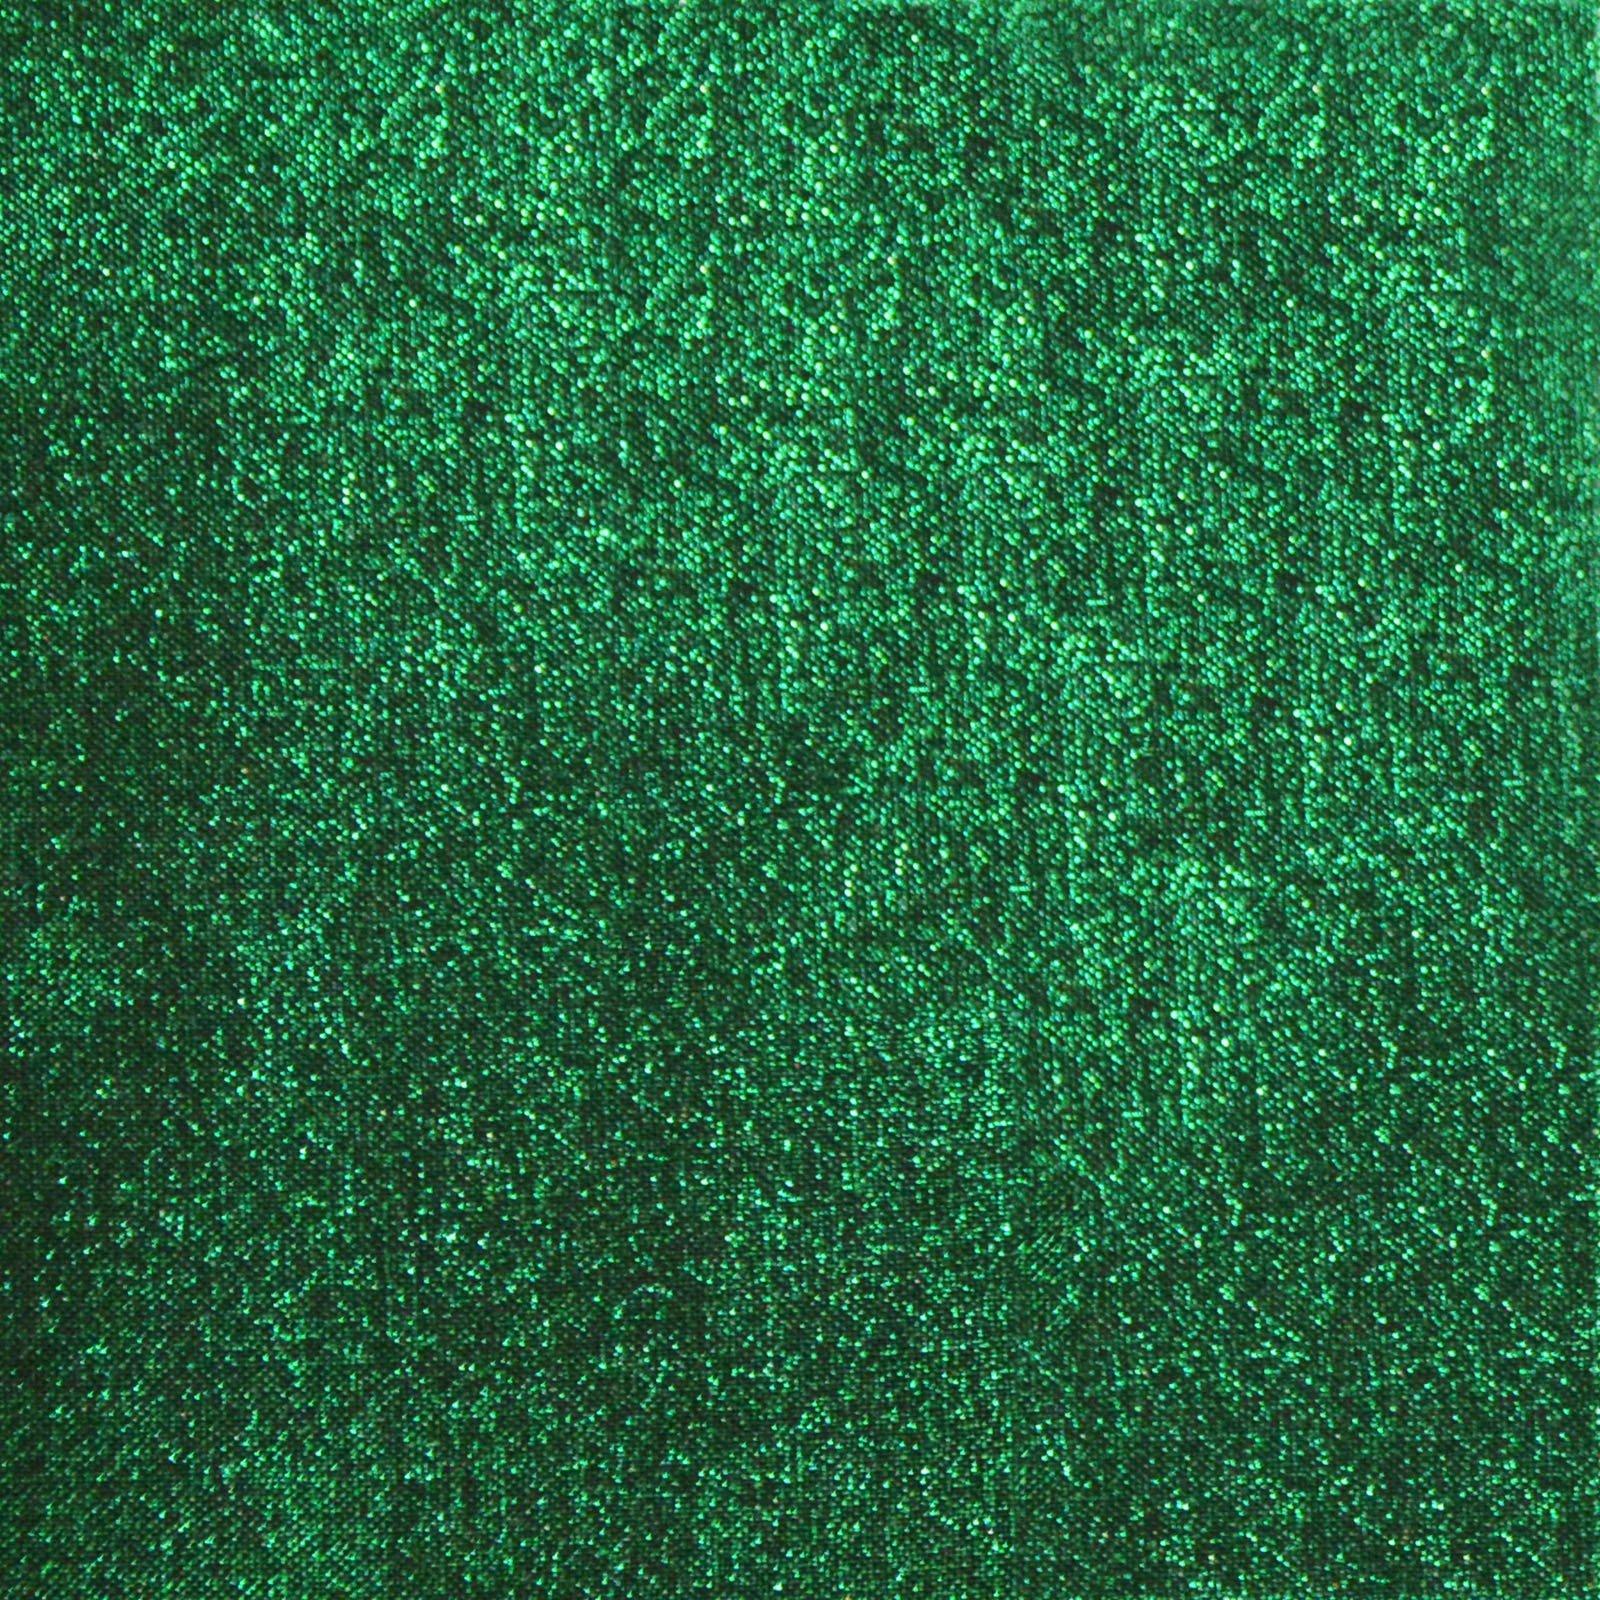 Glitz - Green / Black<br/>Maywood Studio GLI-GRB